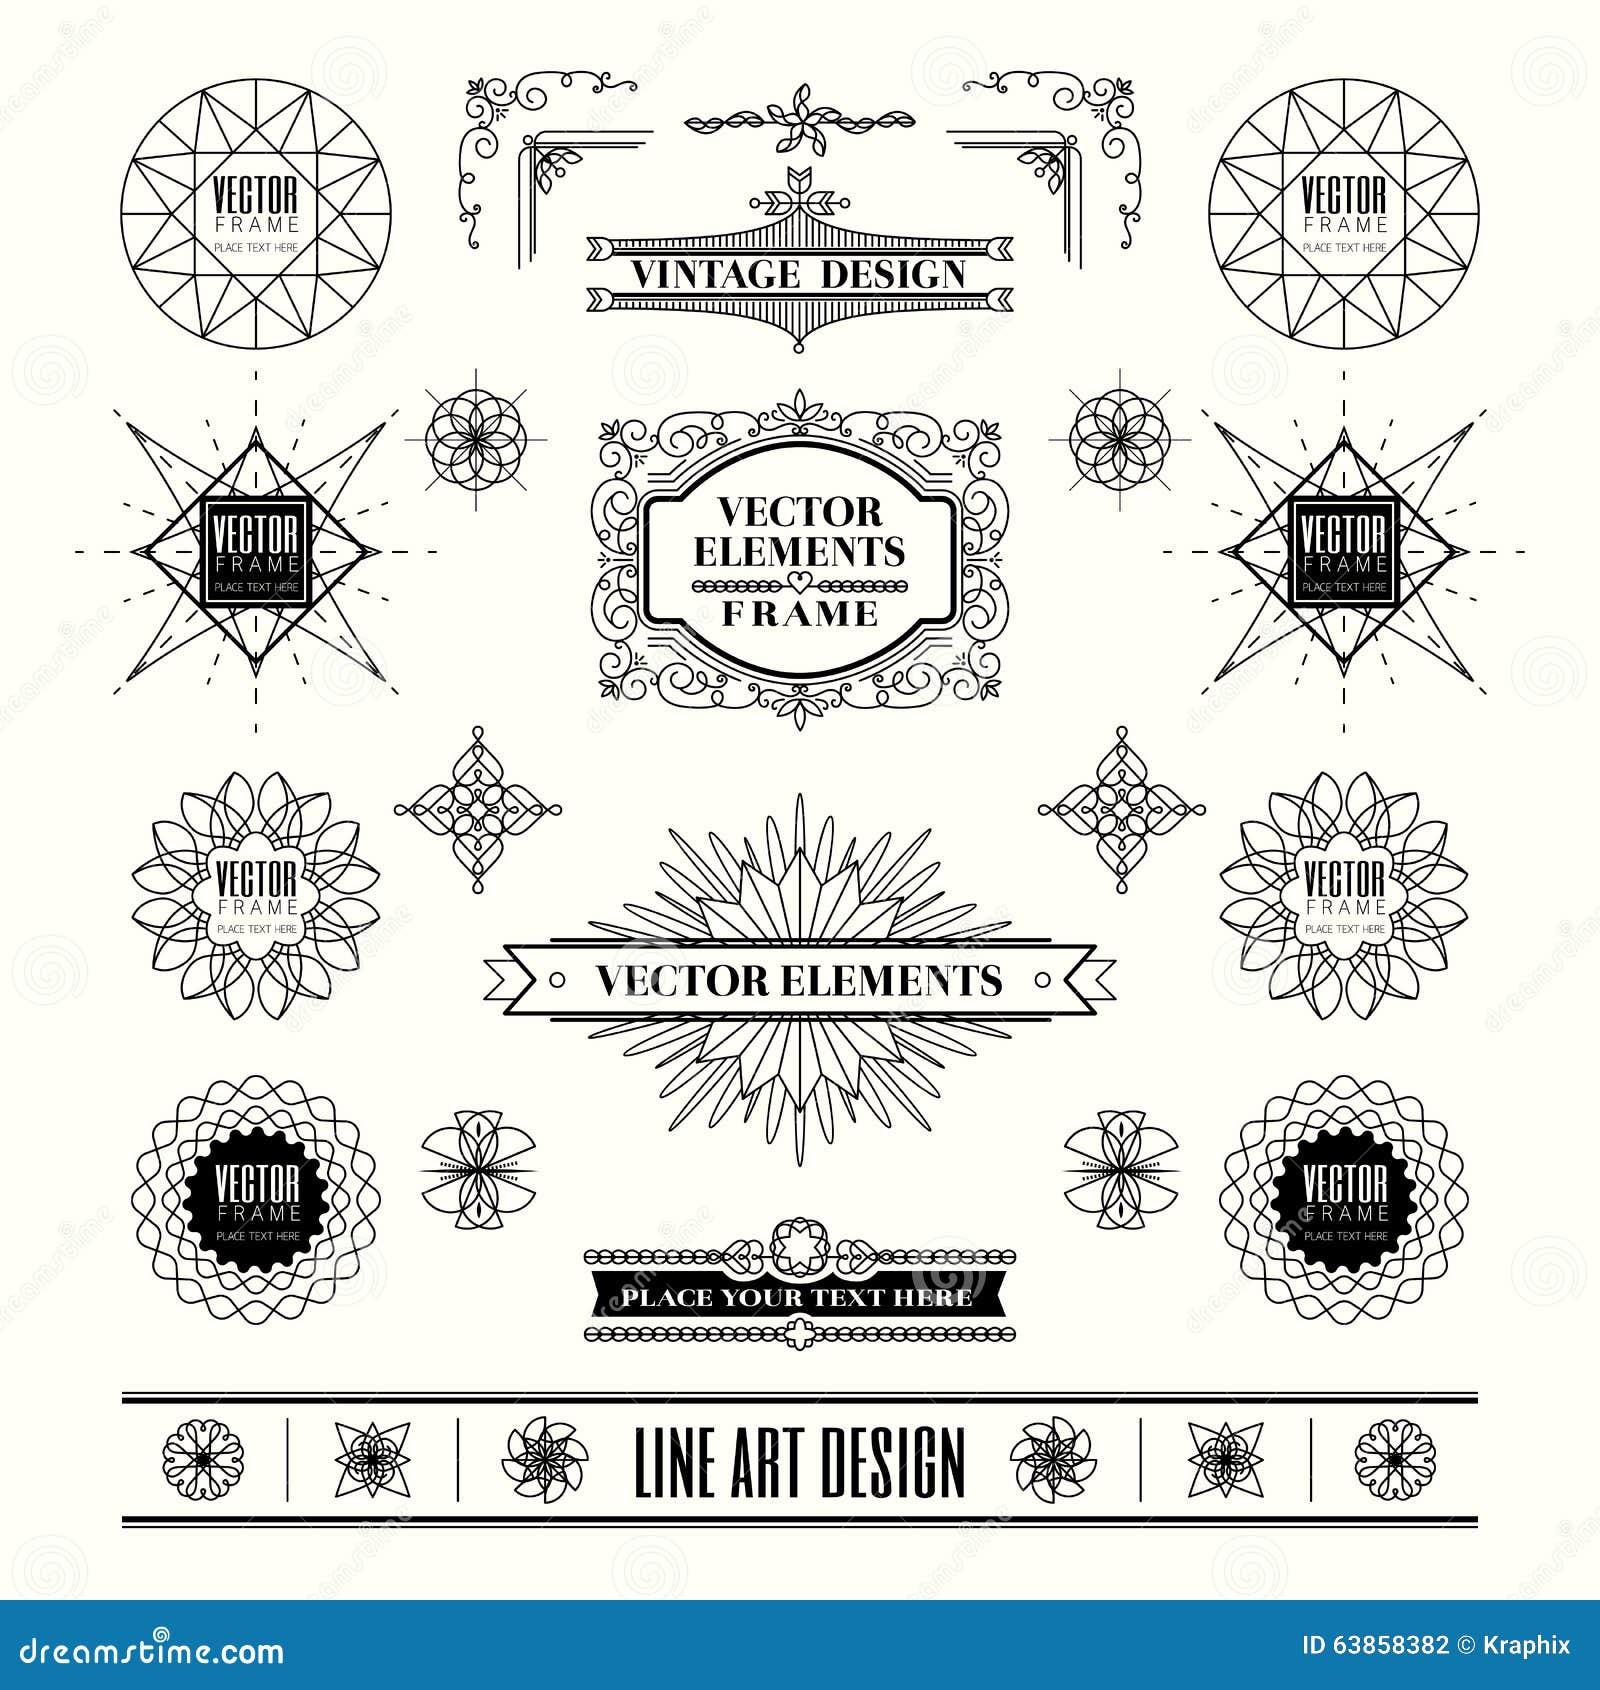 Art Deco Invitation Template are Inspirational Design To Create Nice Invitation Ideas